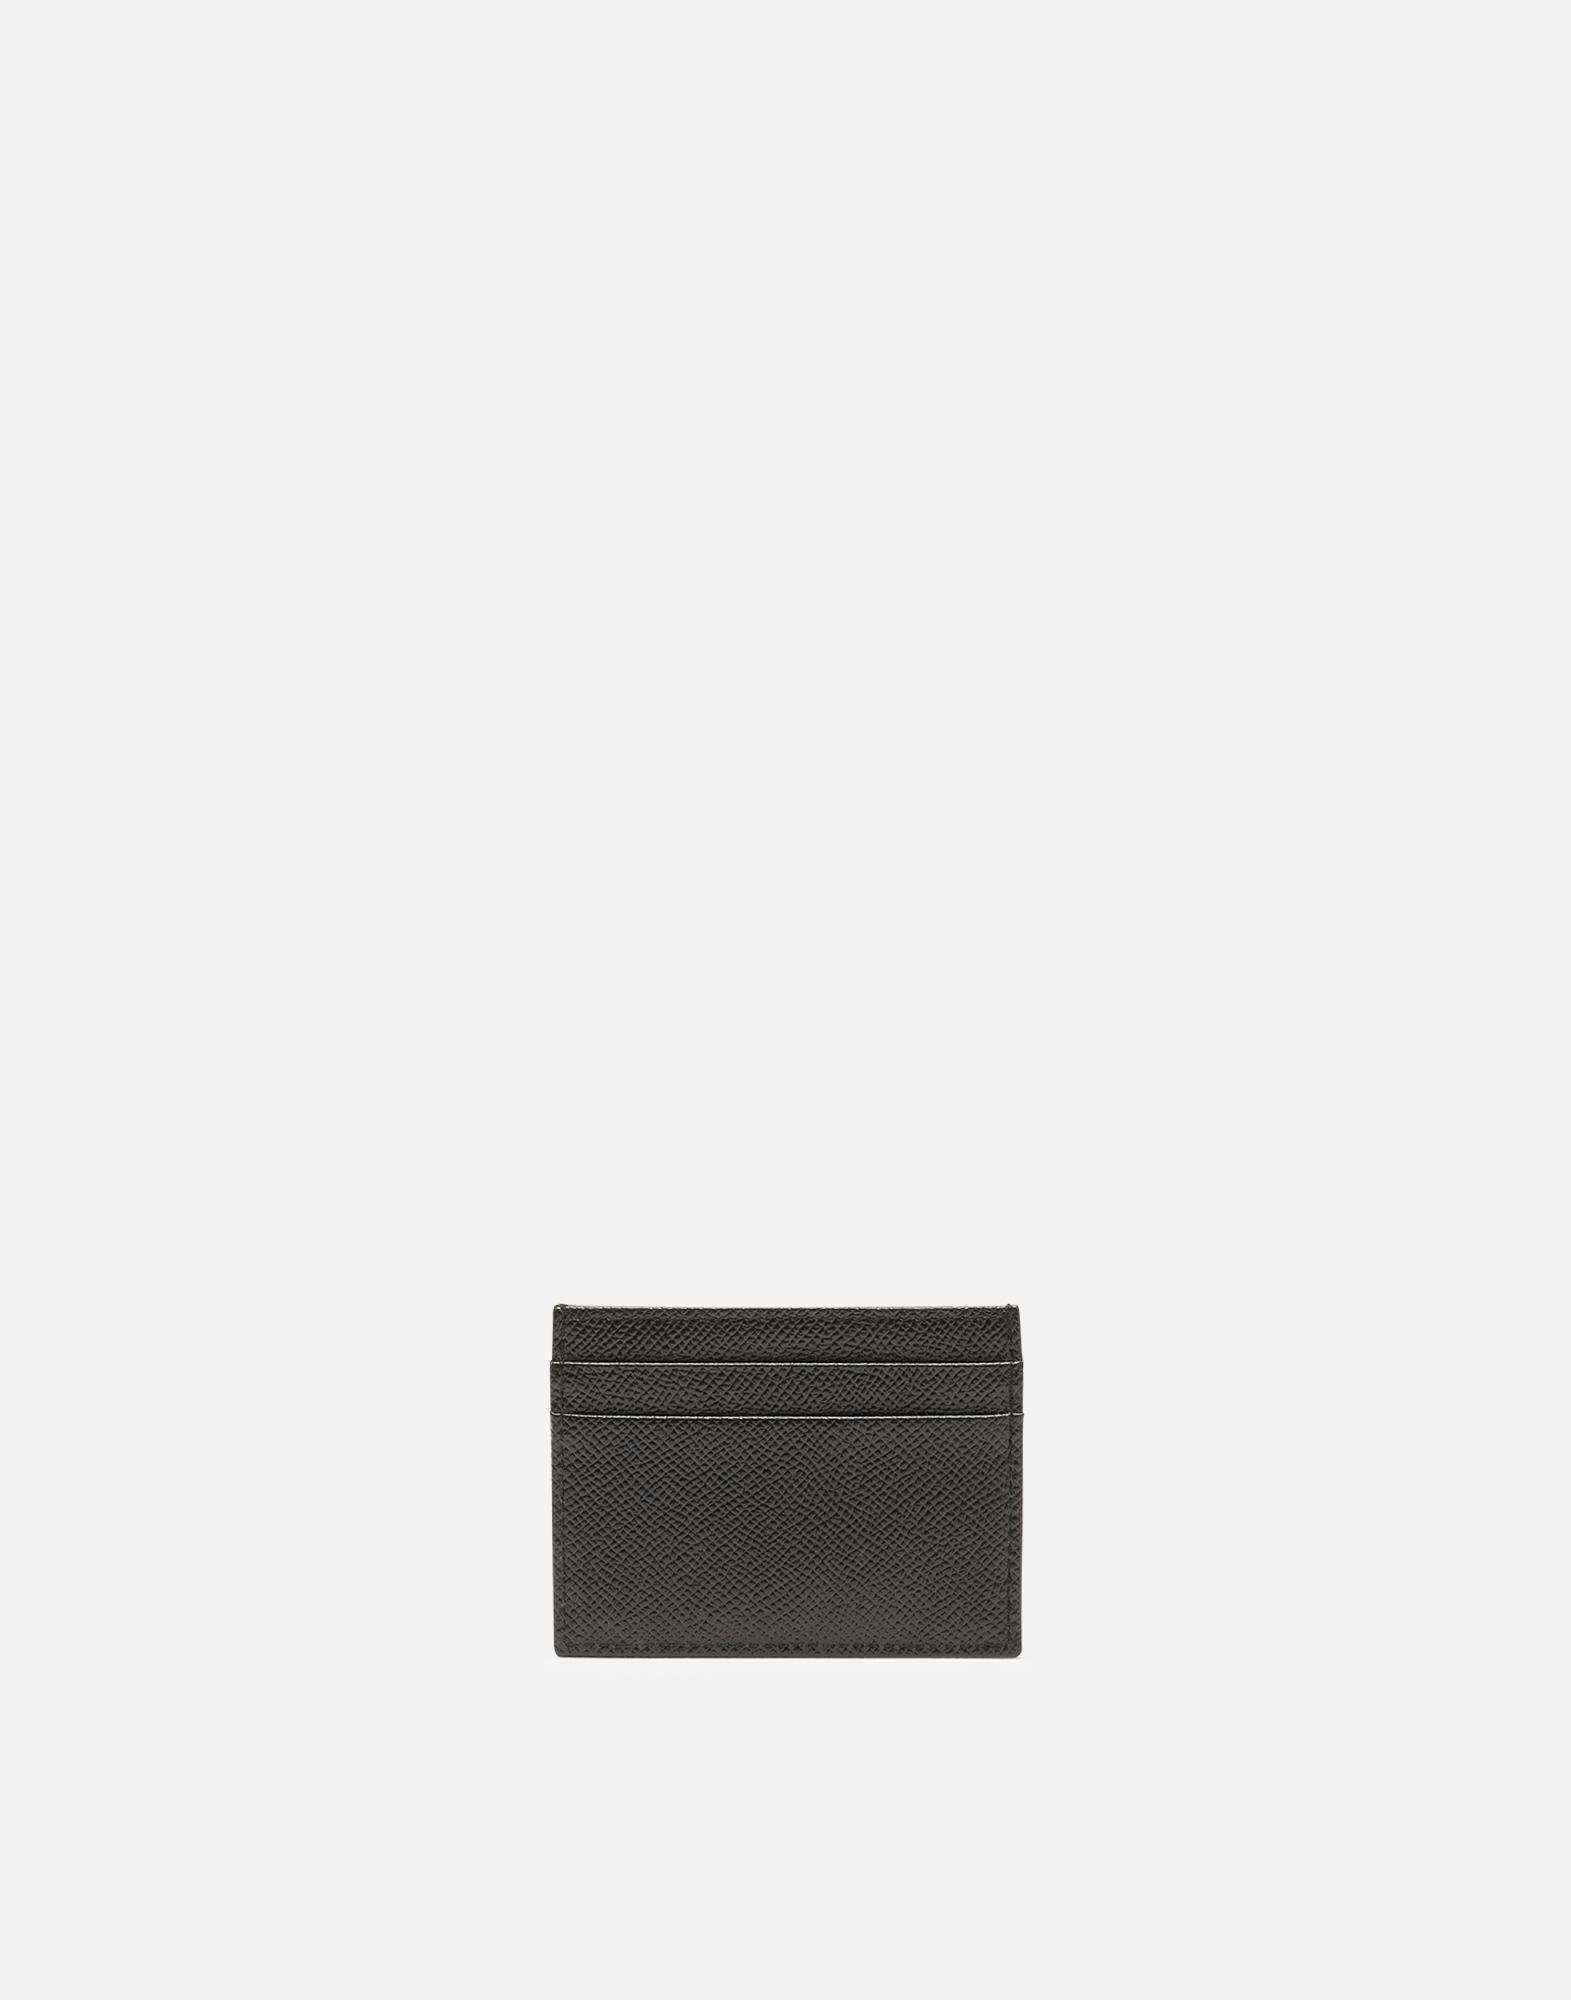 DAUPHINE CALFSKIN CREDIT CARD HOLDER